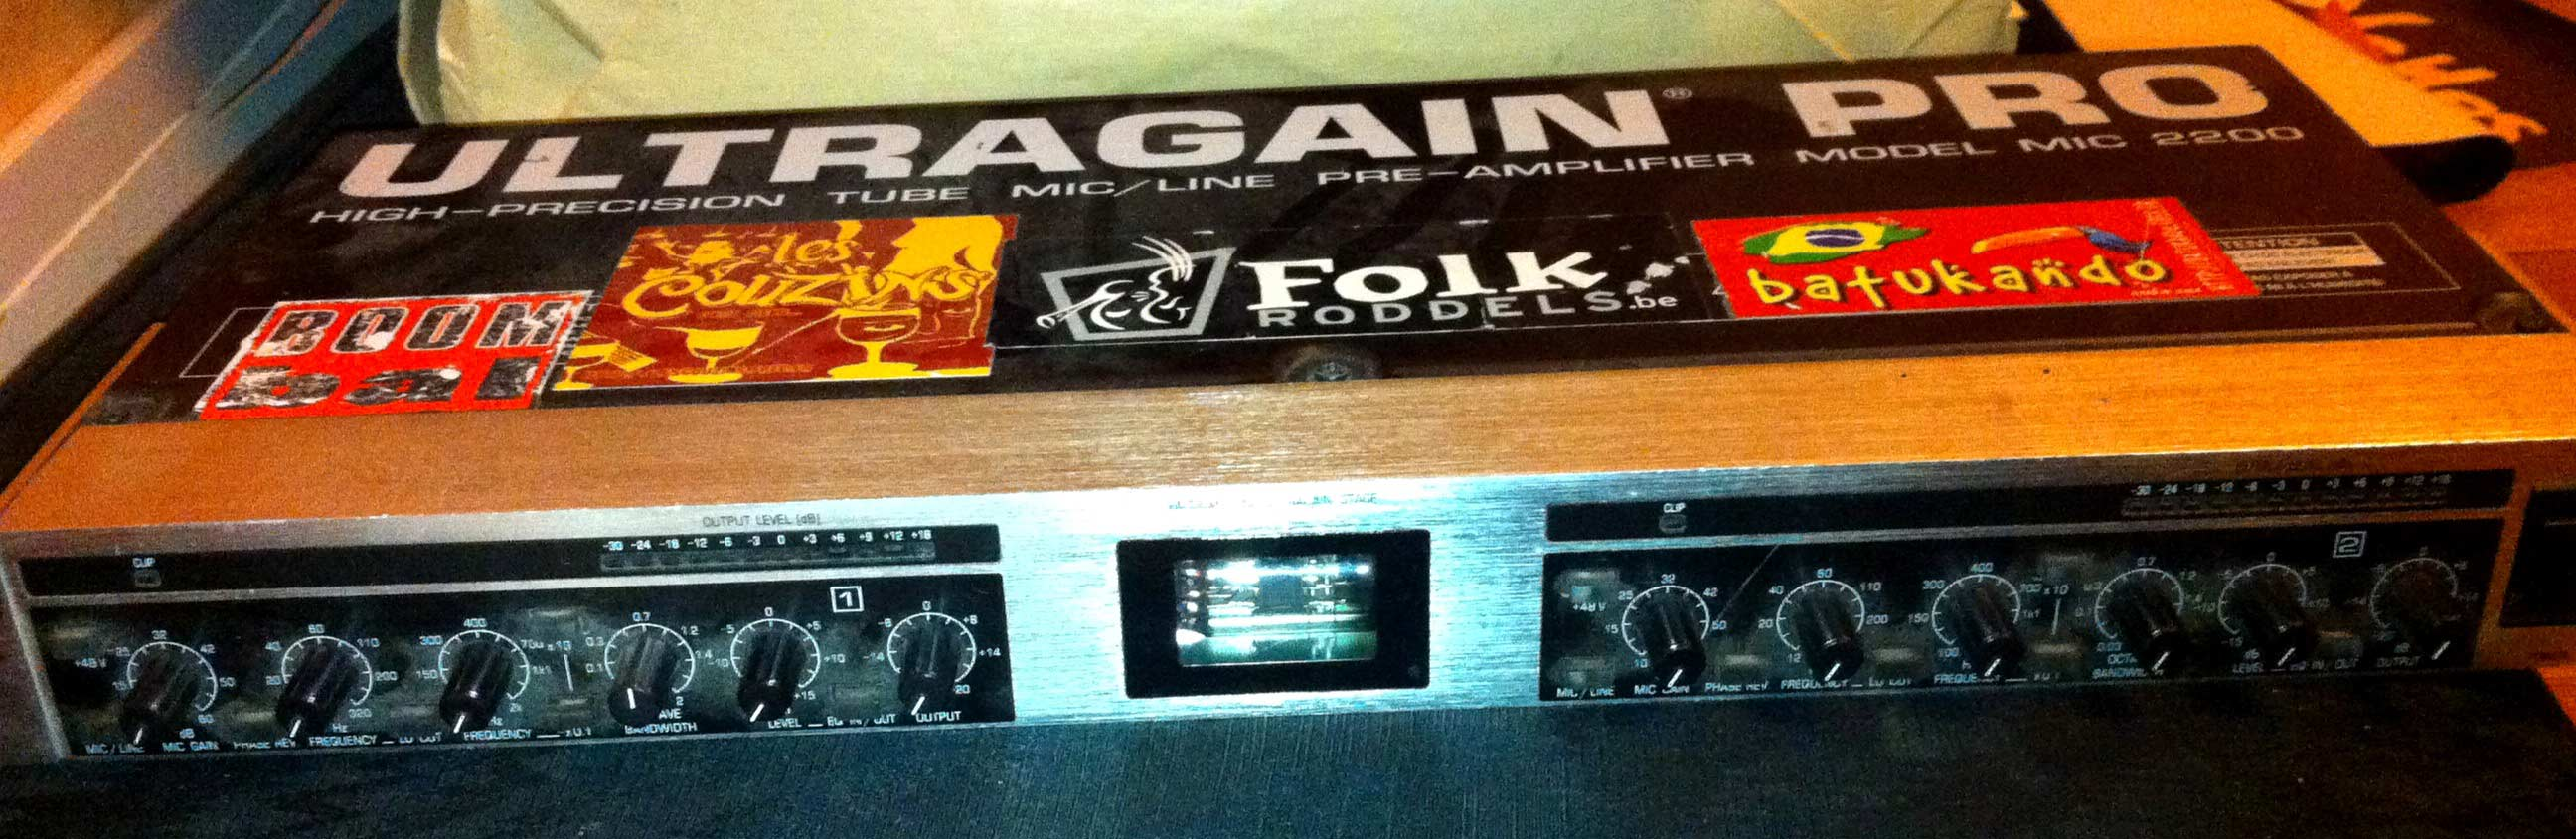 behringer ultragain pro mic2200 manual